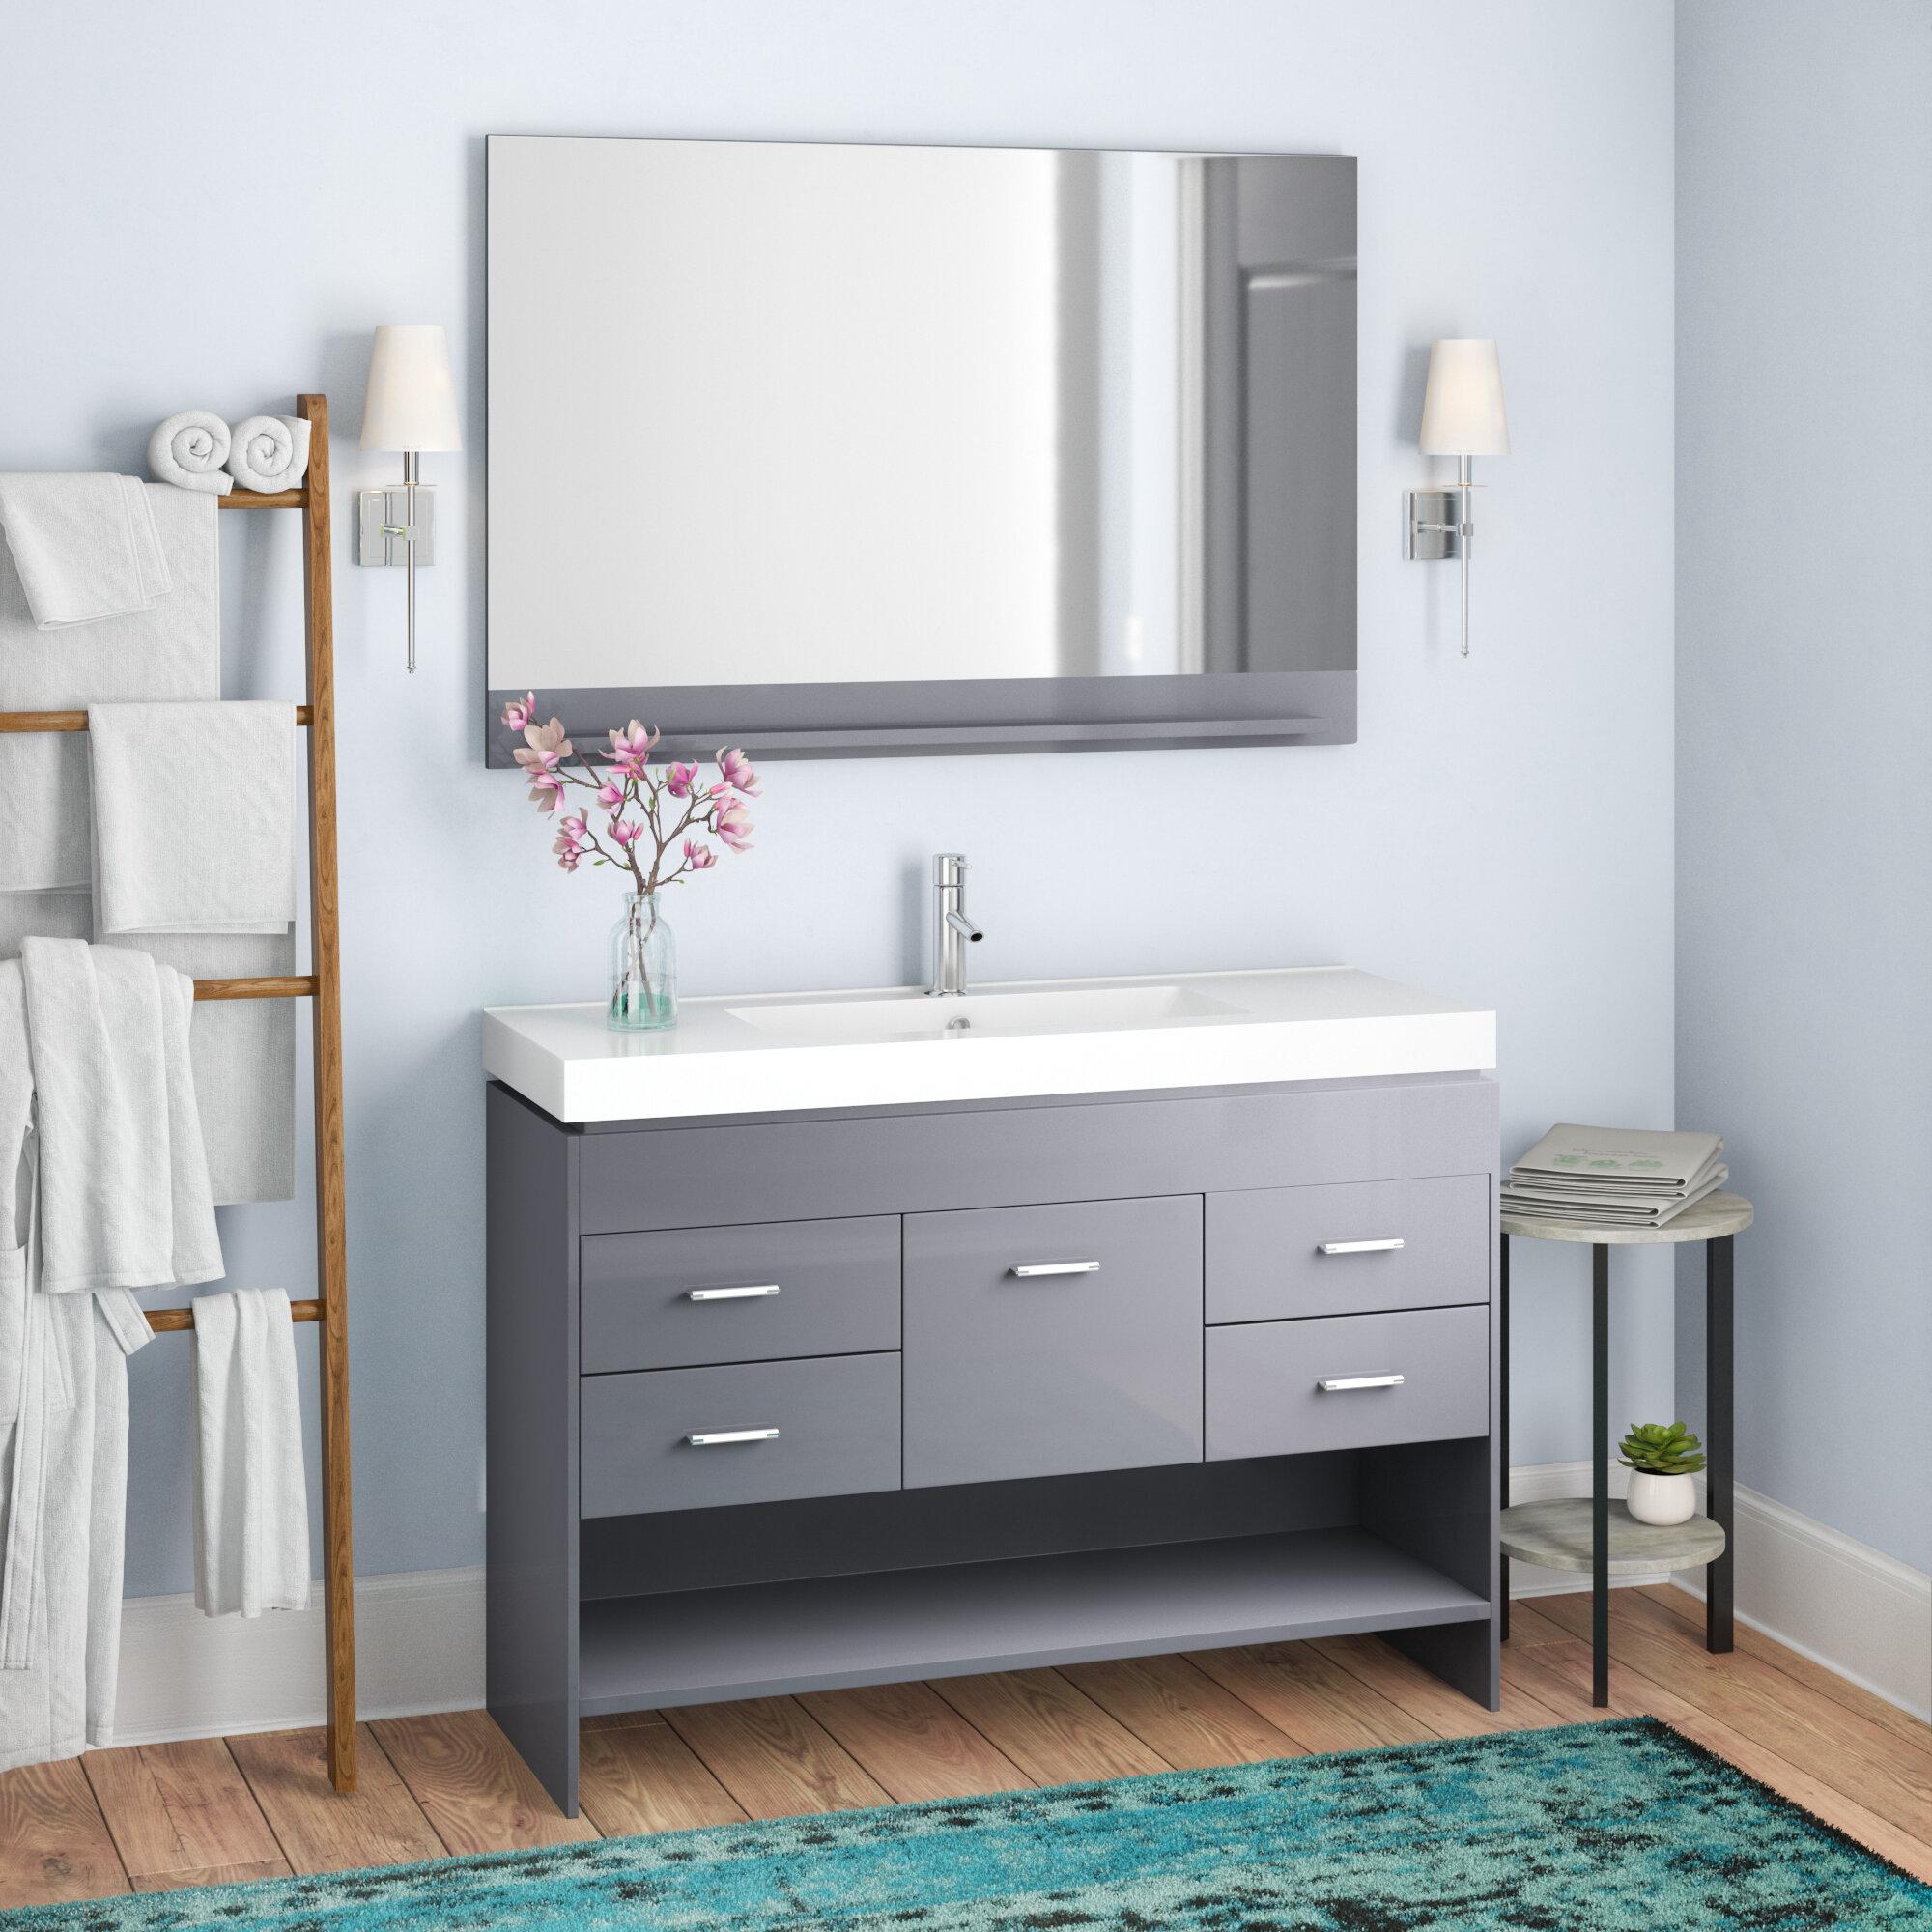 Mercury Row Carstens 47 Single Bathroom Vanity Set With Ceramic Top And Mirror Reviews Wayfair